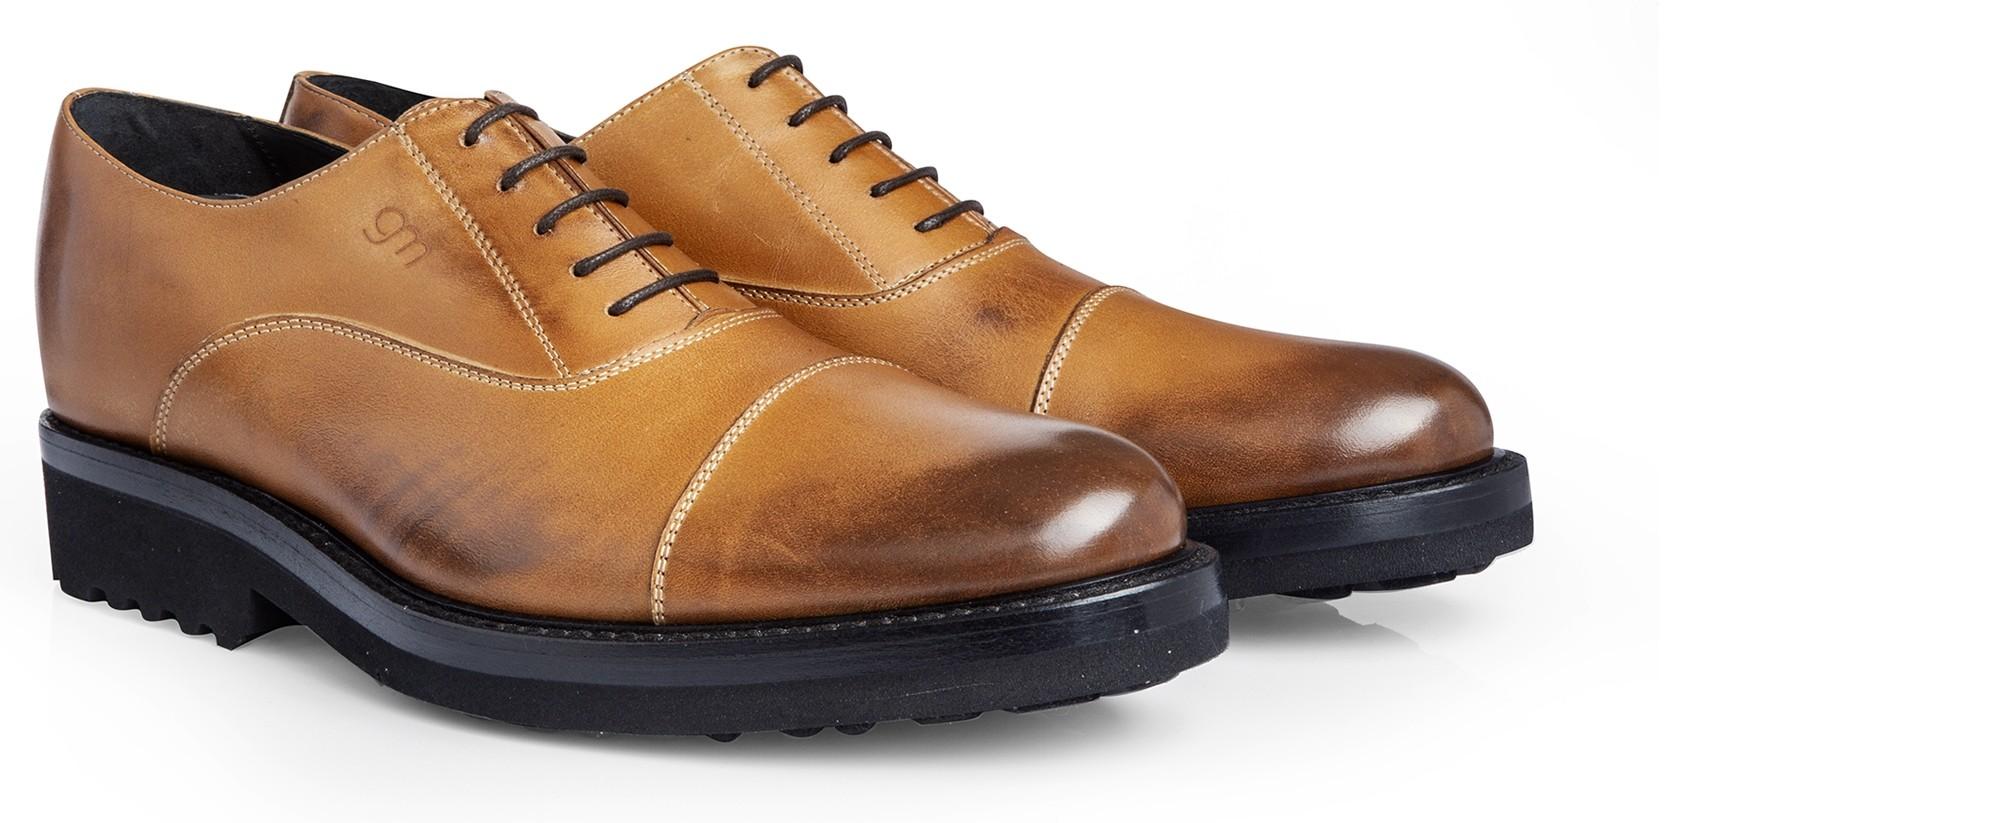 Chaussures Rehaussantes